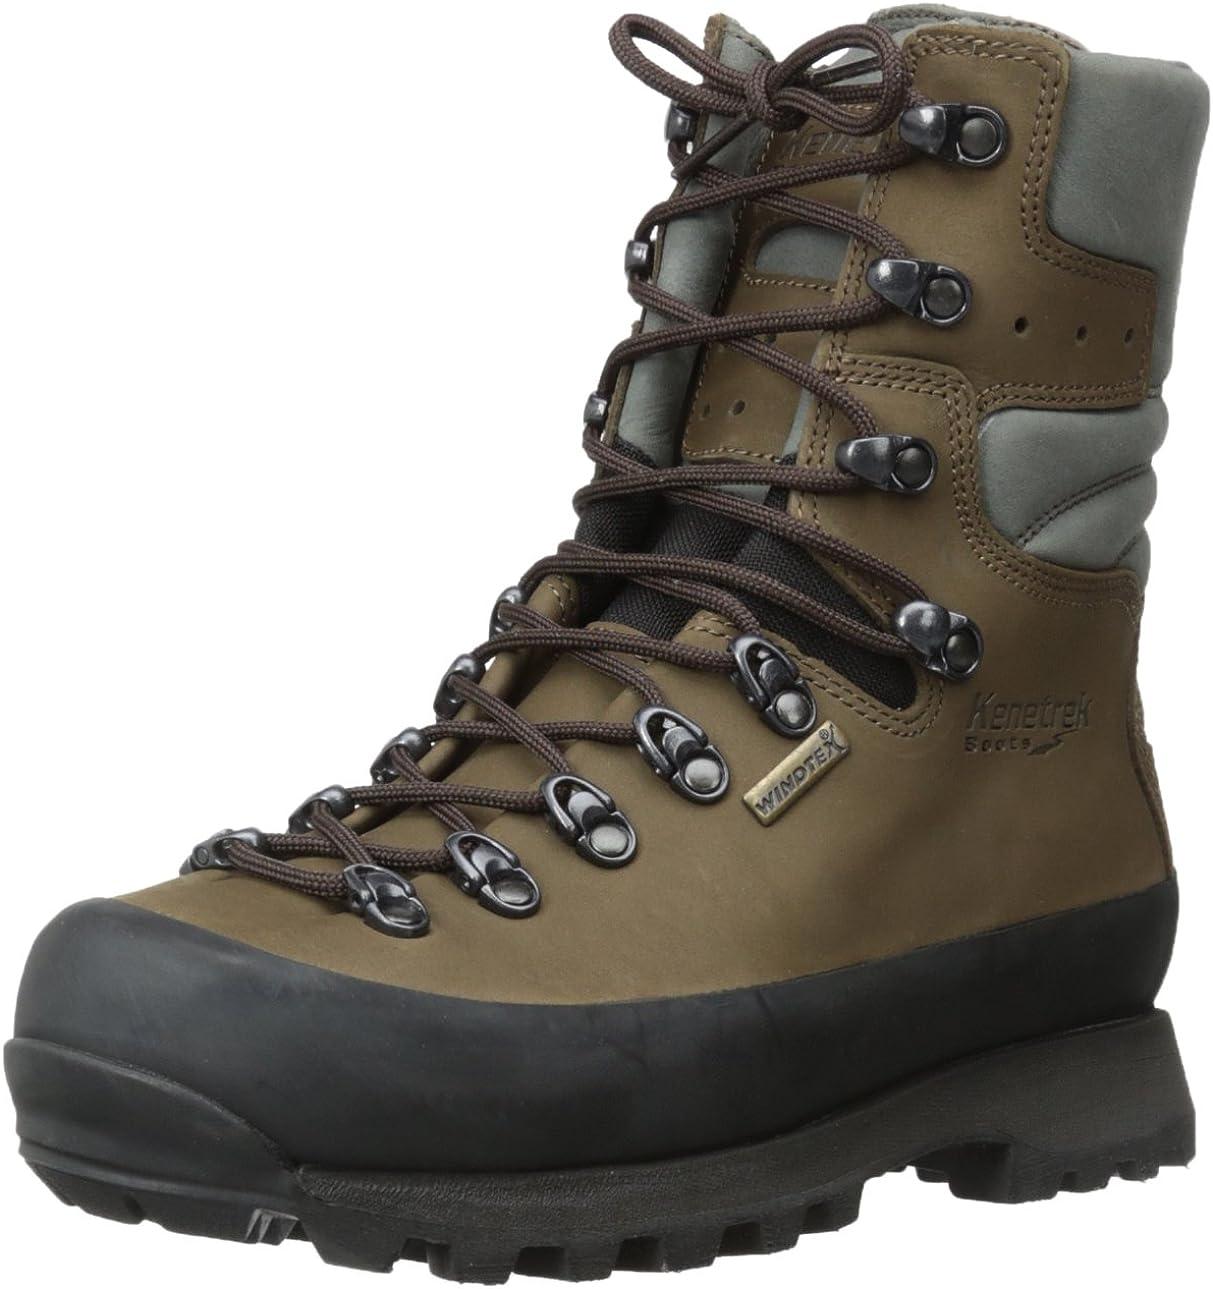 Kenetrek Women s Mountain Extreme Non-Insulated Hiking Boots